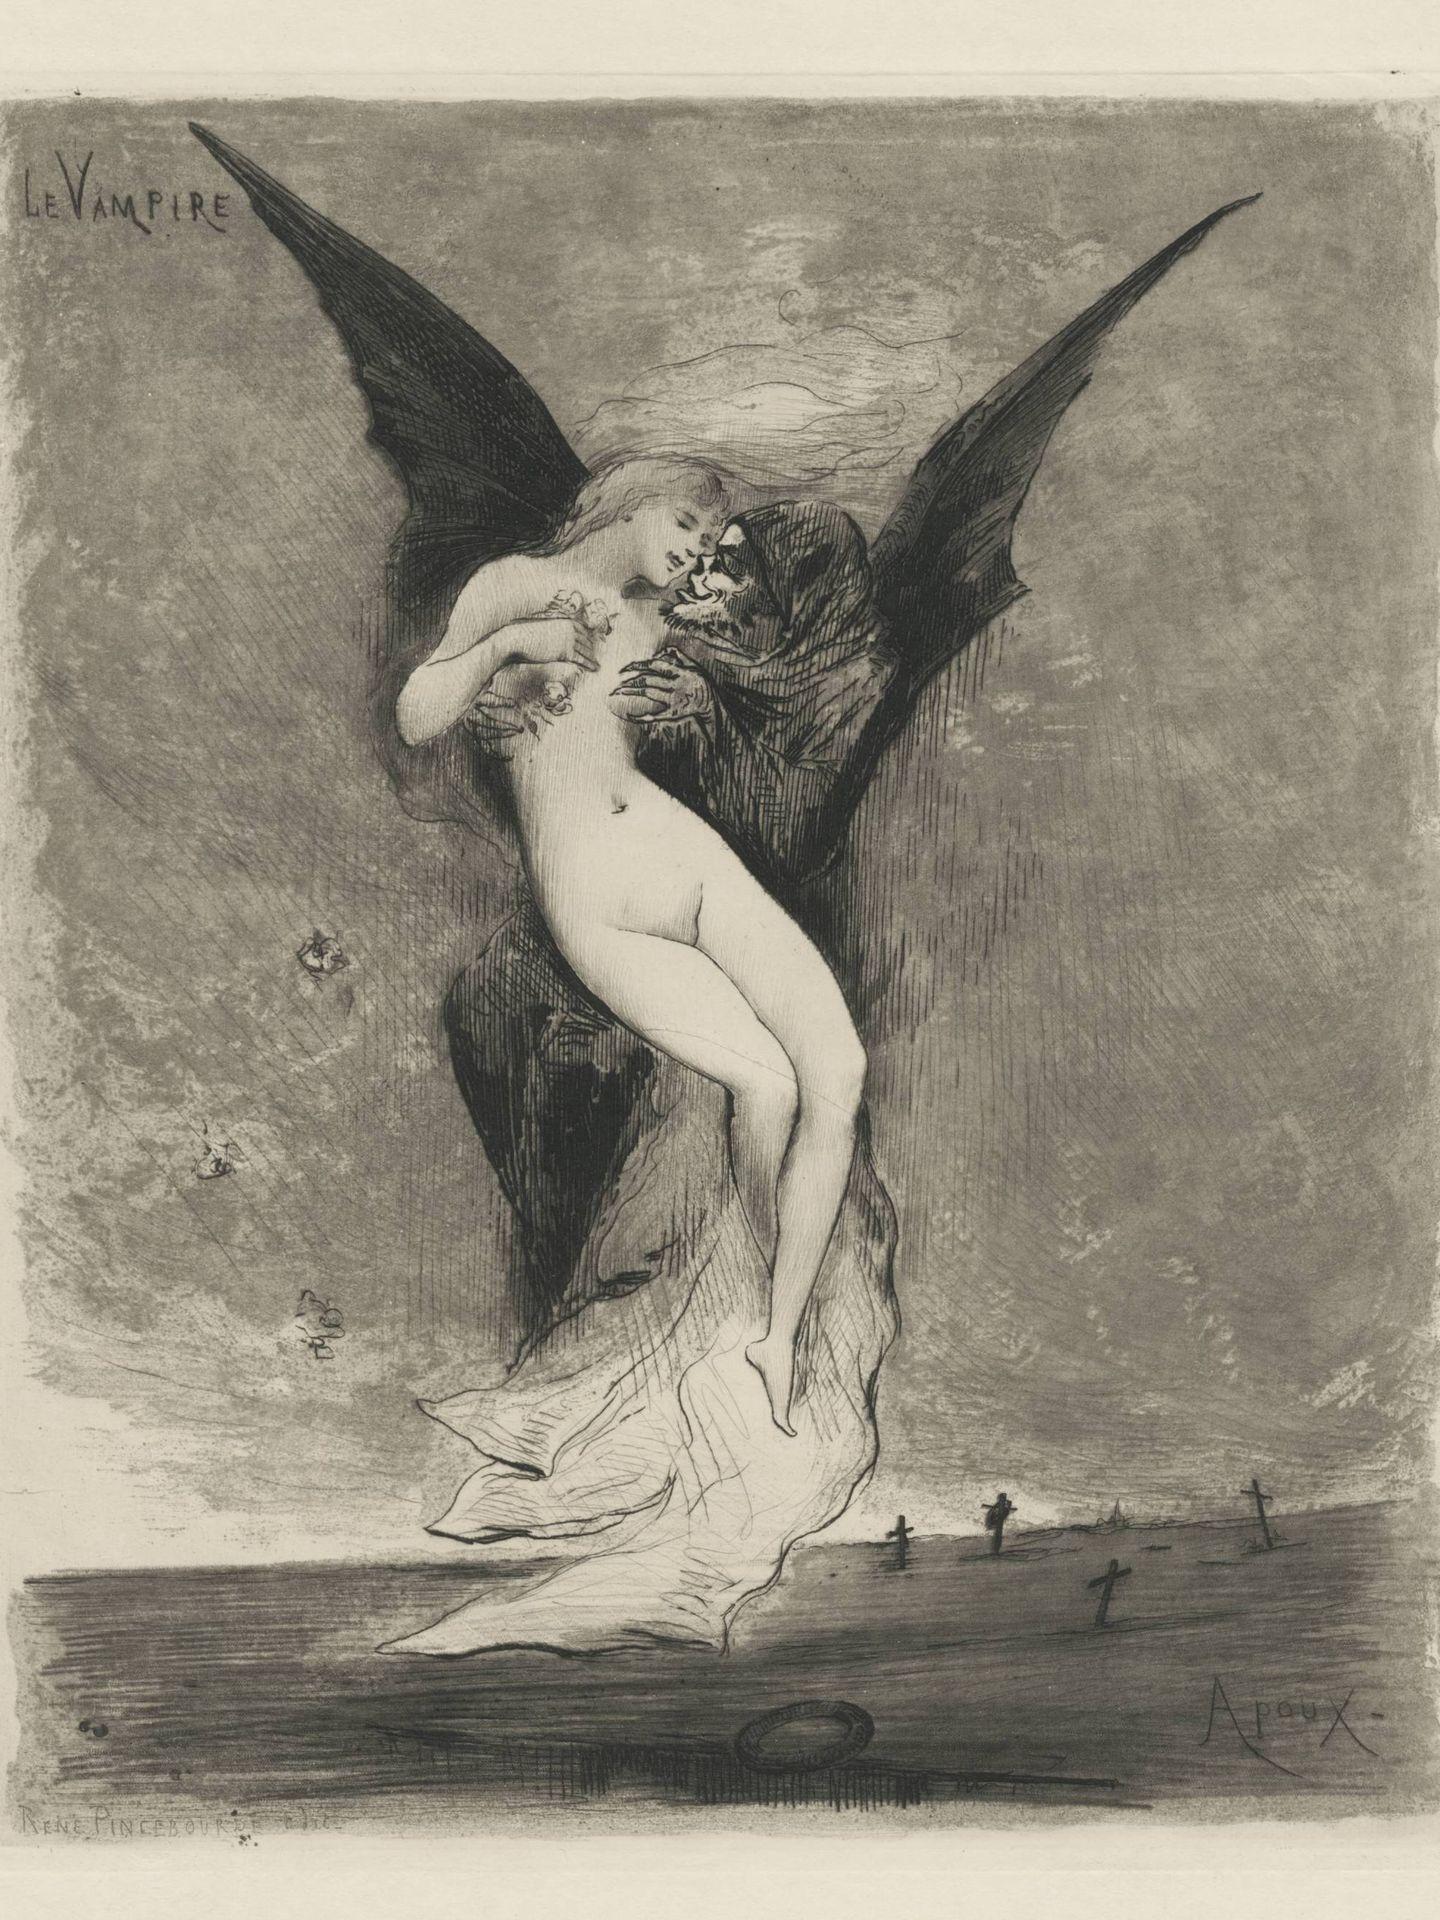 'Le Vampire' (1890), de Joseph Apoux. (CaixaForum)